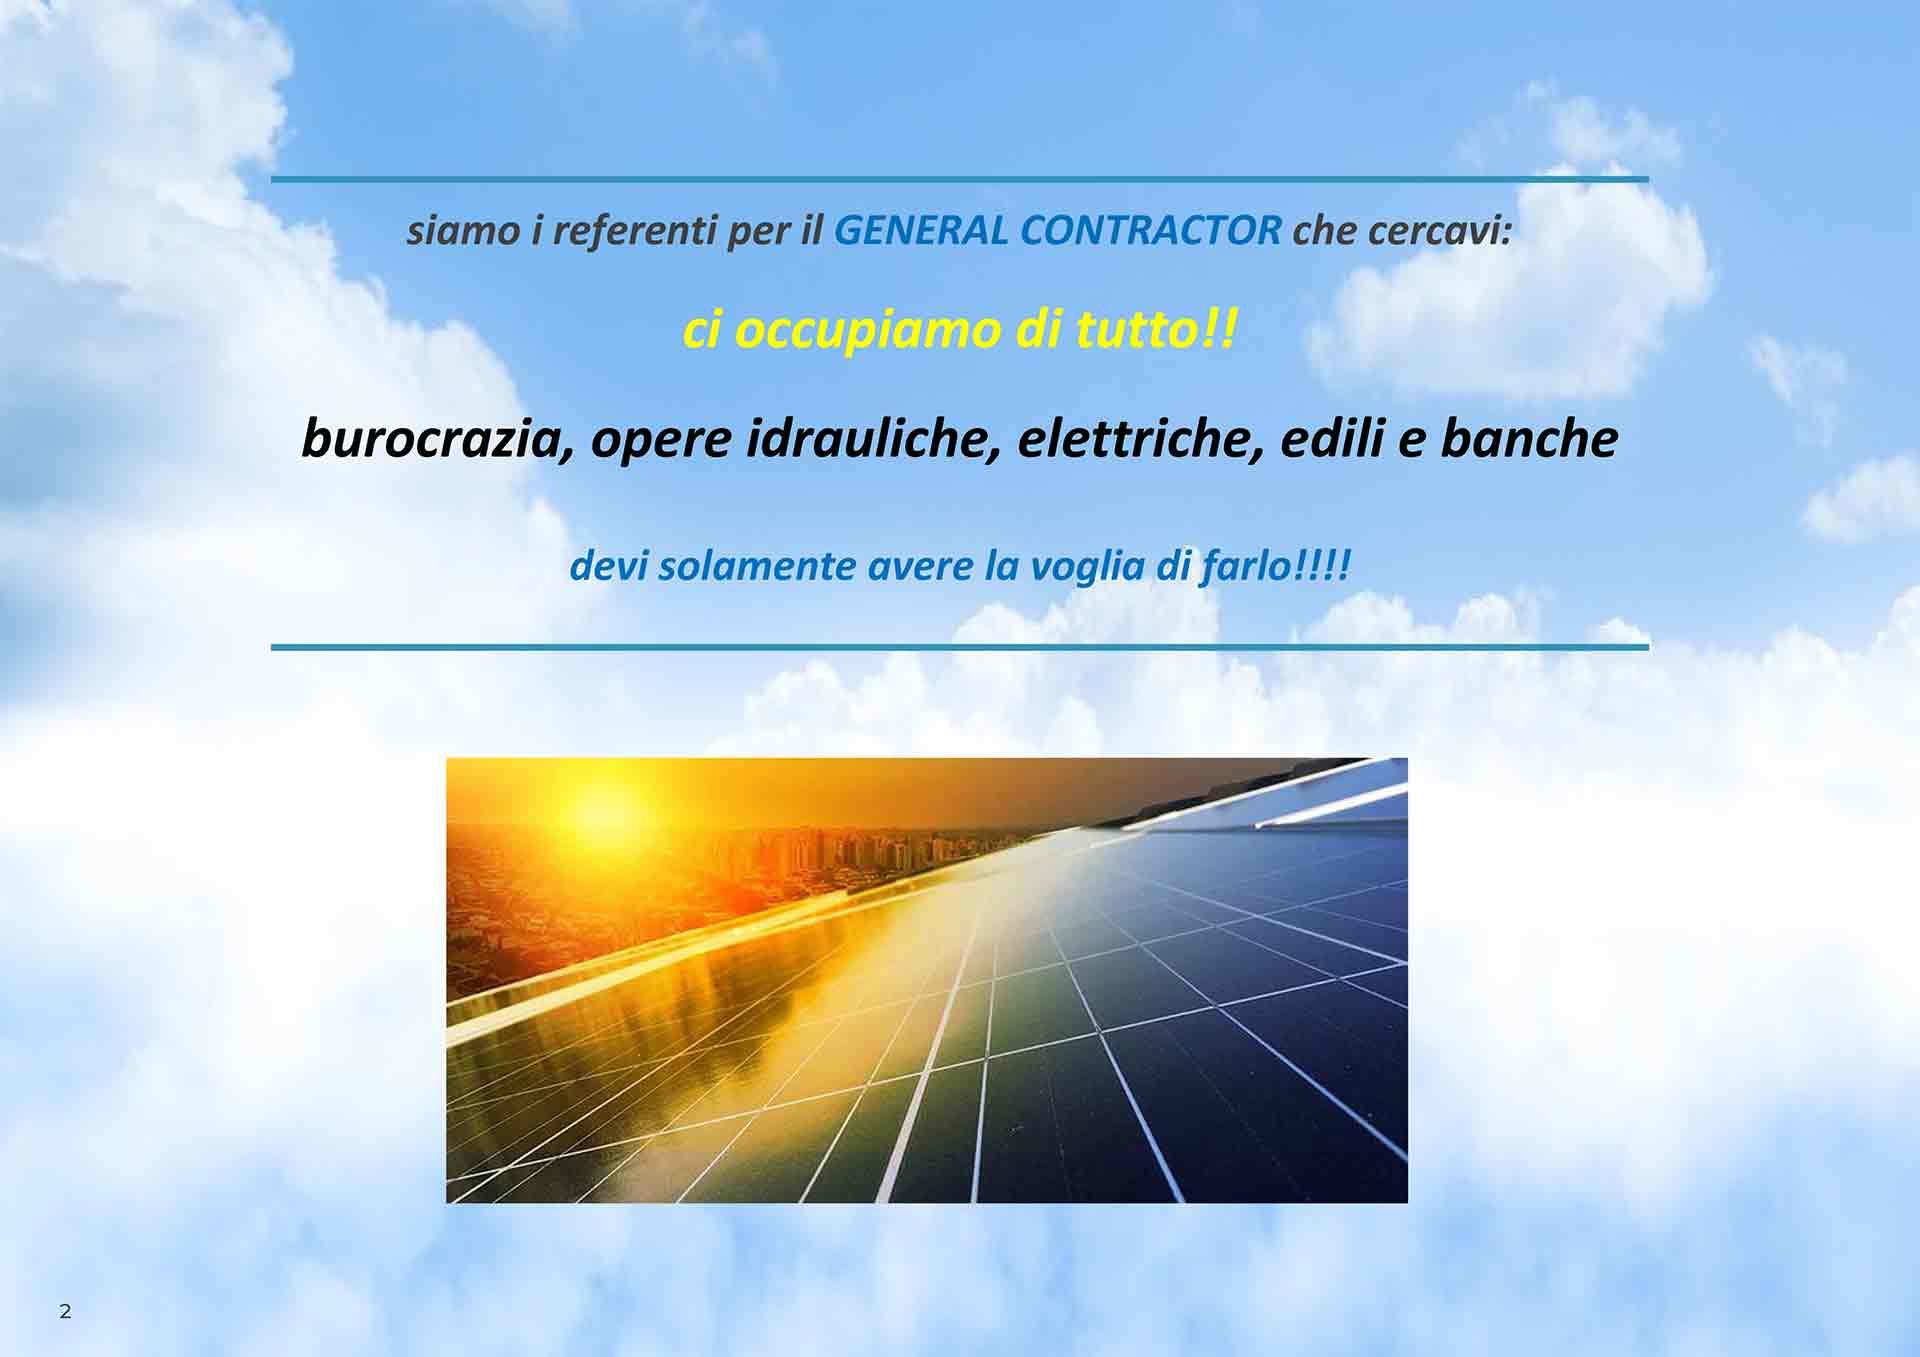 general contractor superbonus Ravenna